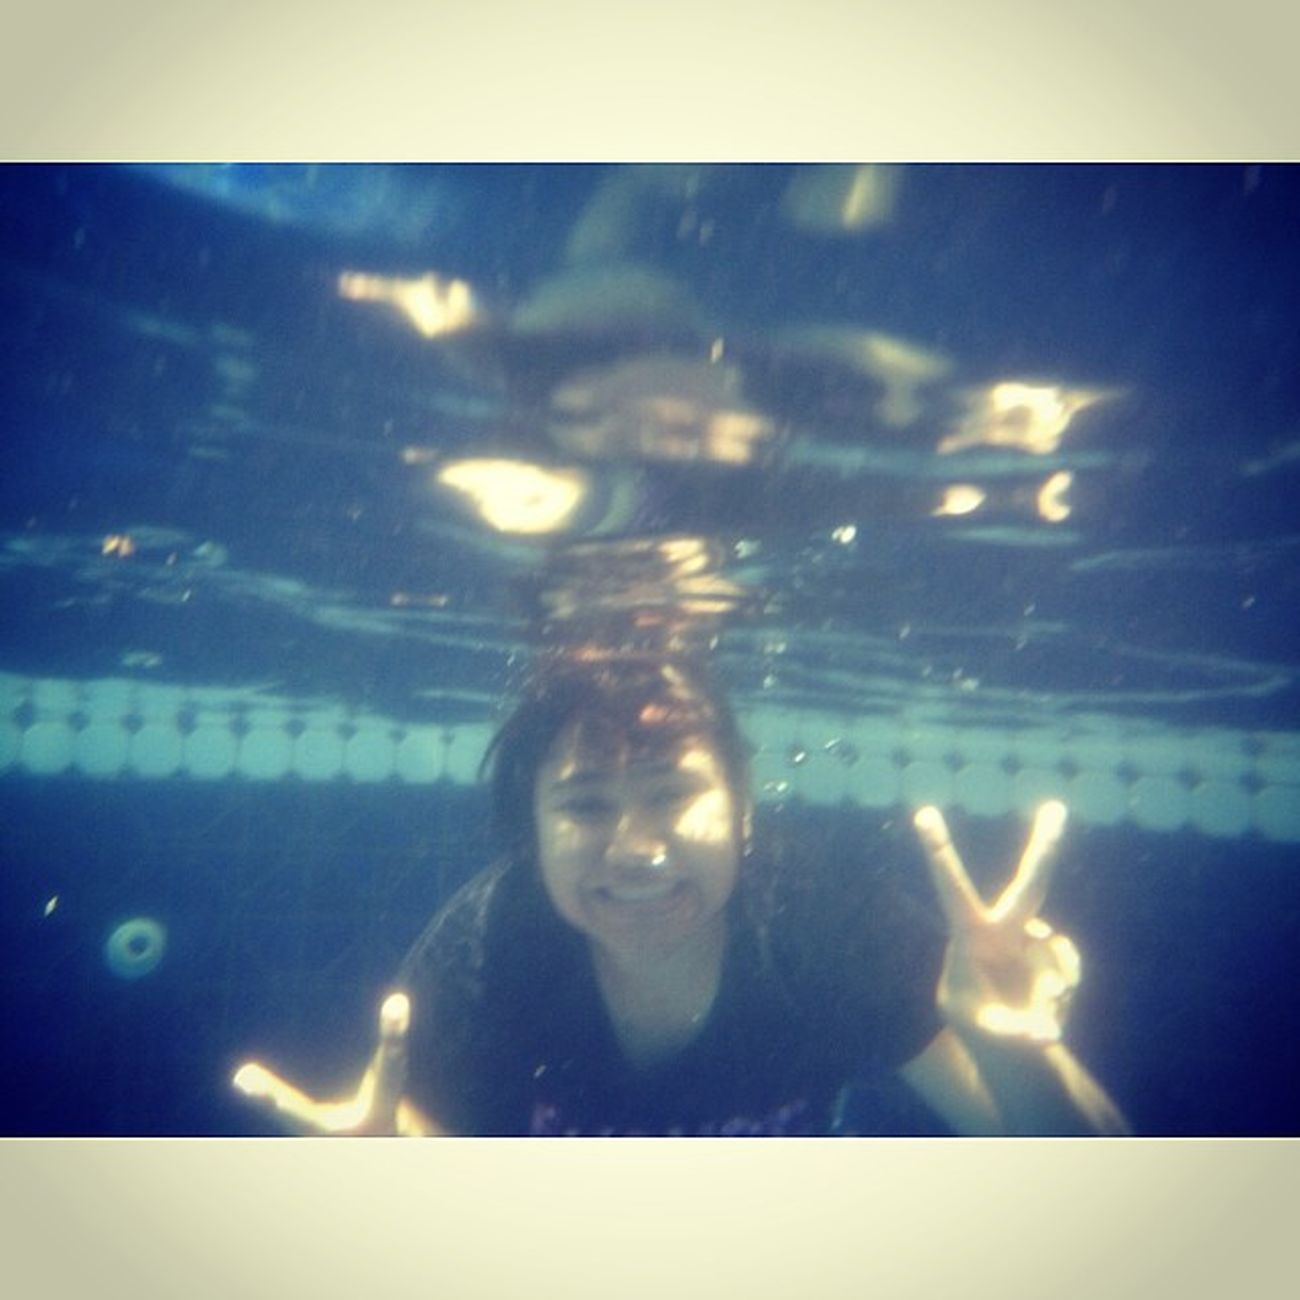 Squaready Underwater Instabanjar Instabungas